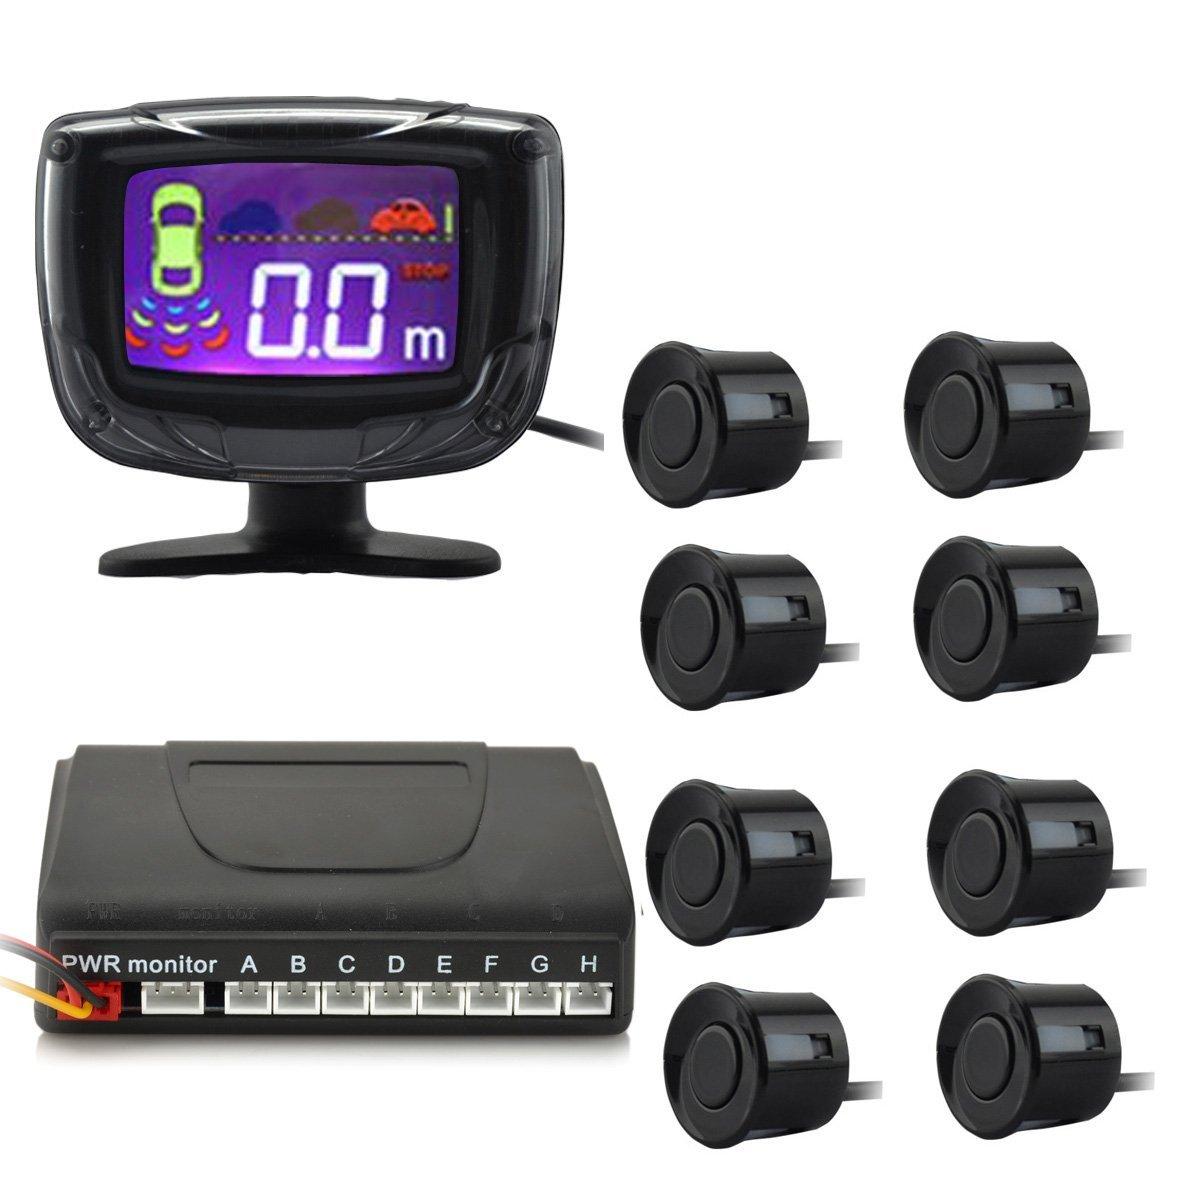 IDS Home PZ500-8 2'' 8-Probes LCD Digital Display Screen Car Parking Sensor System Alarm by three-step Bibi sound(DC 12V)